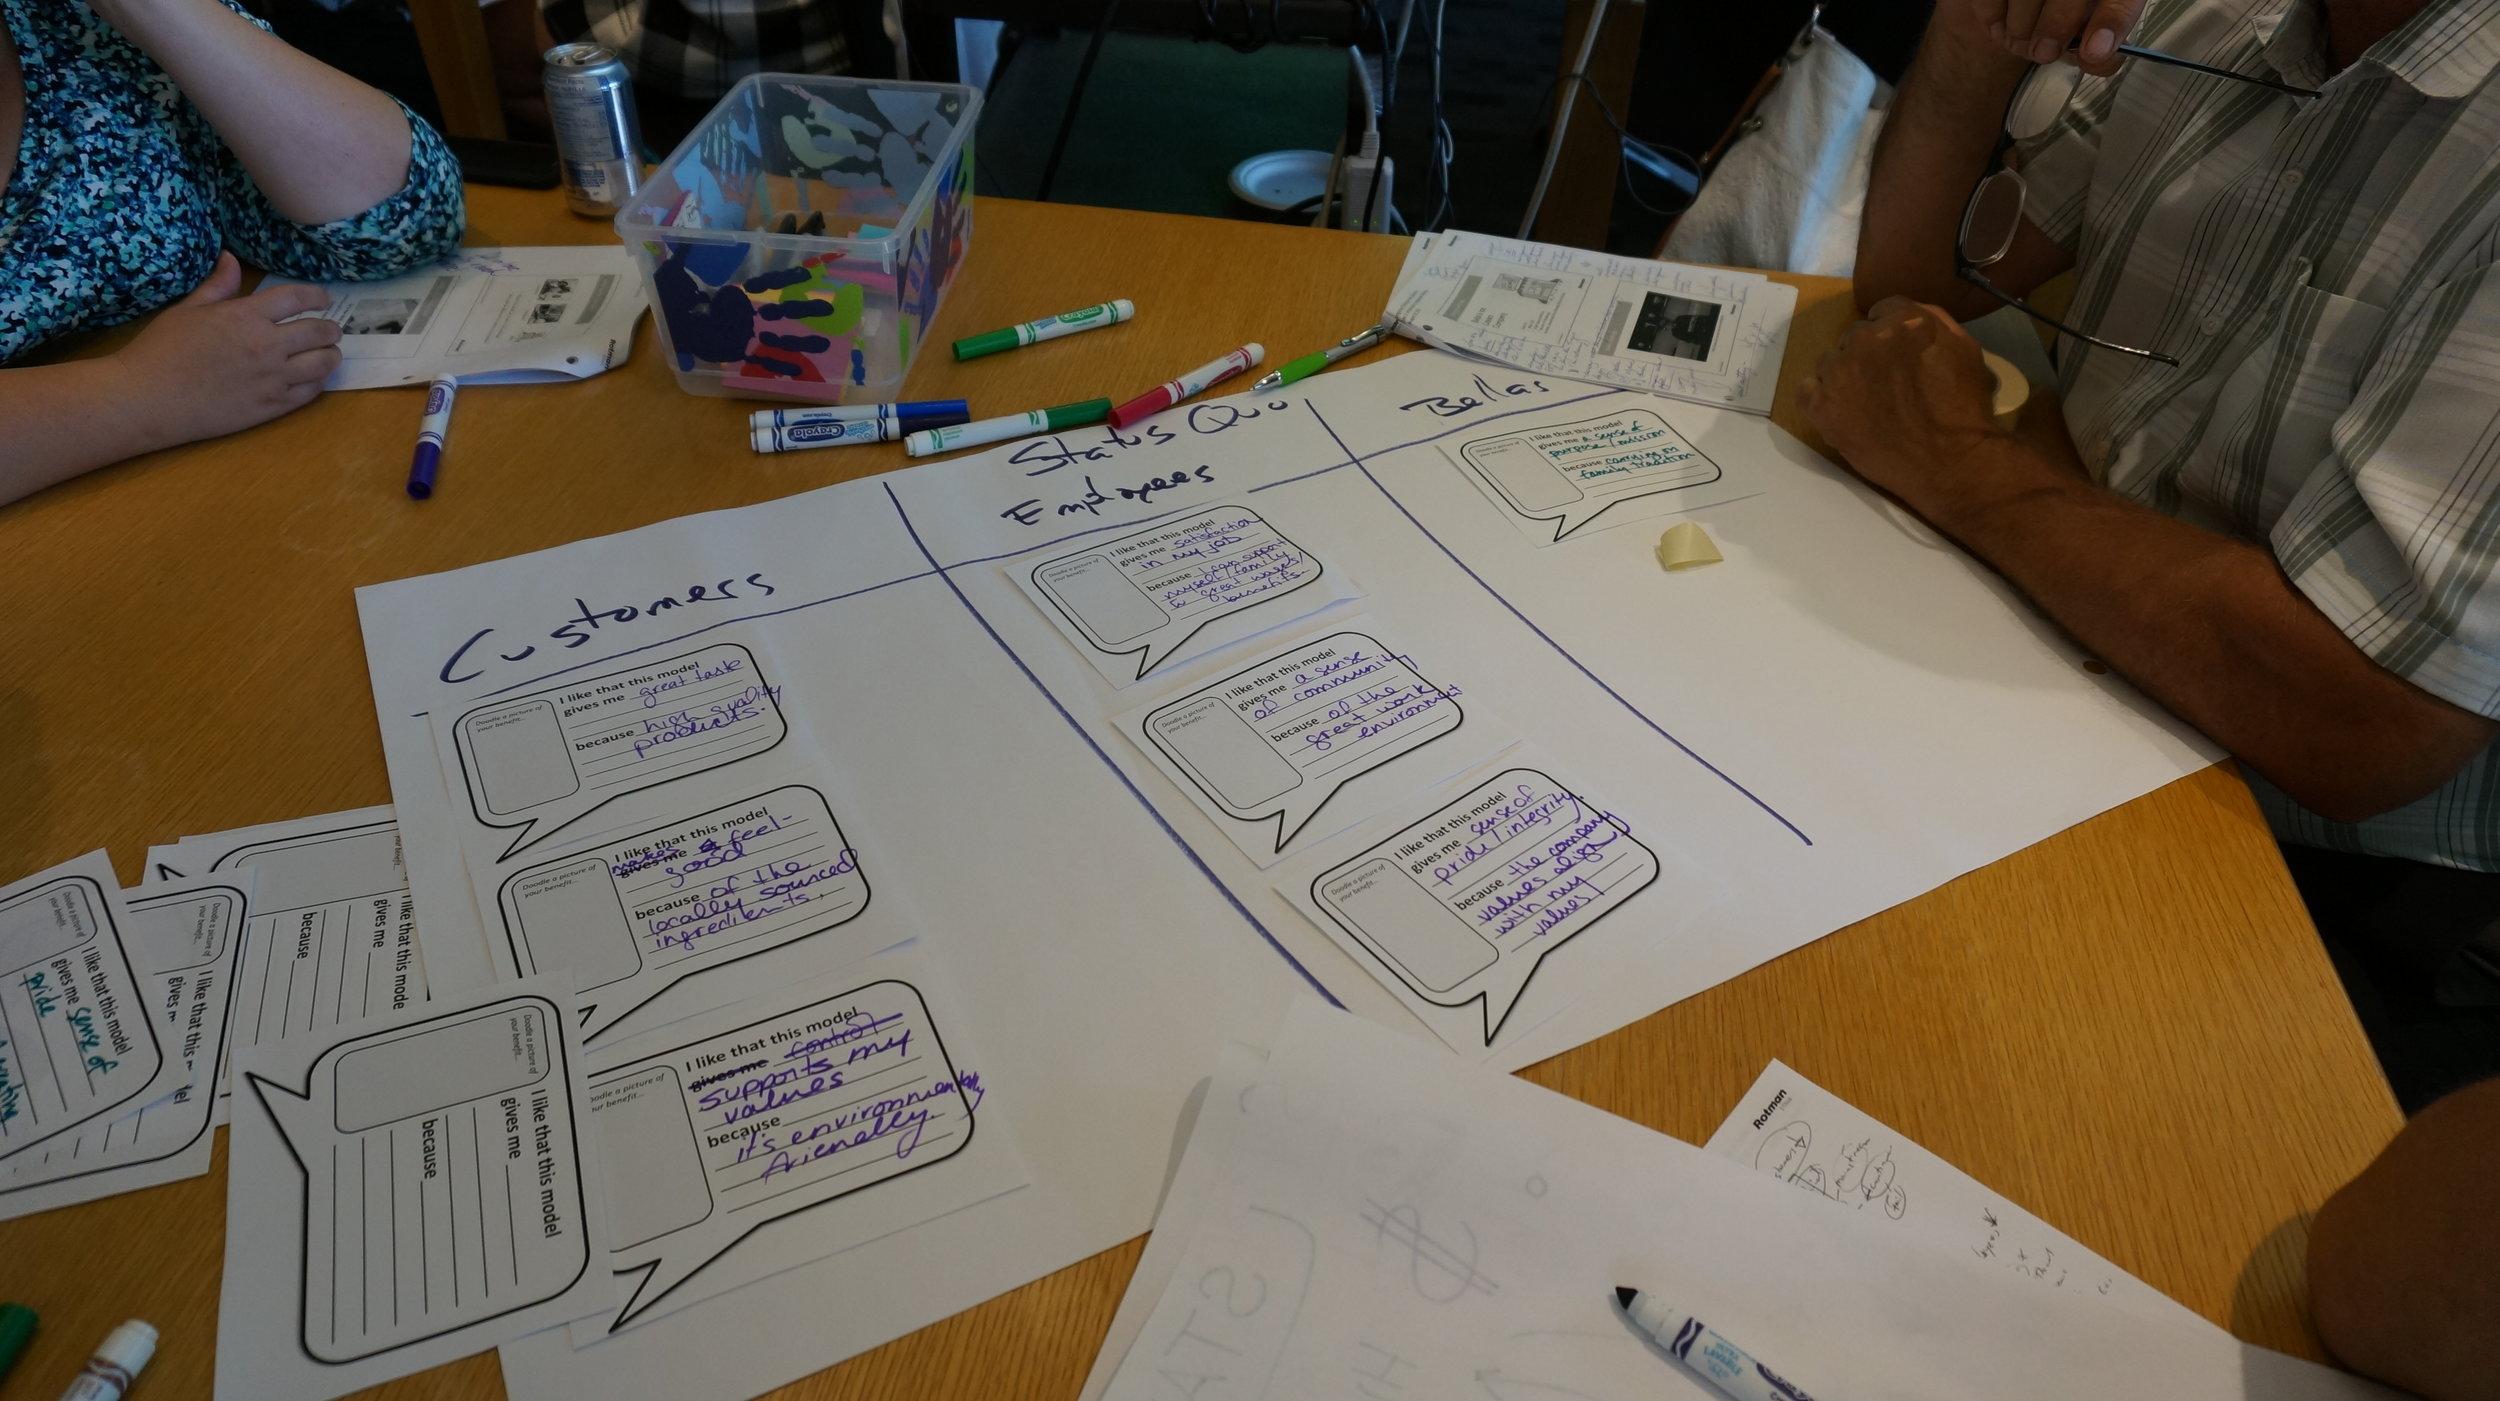 Bella's Ice Cream Challenge - A case study in the Integrative Thinking process.